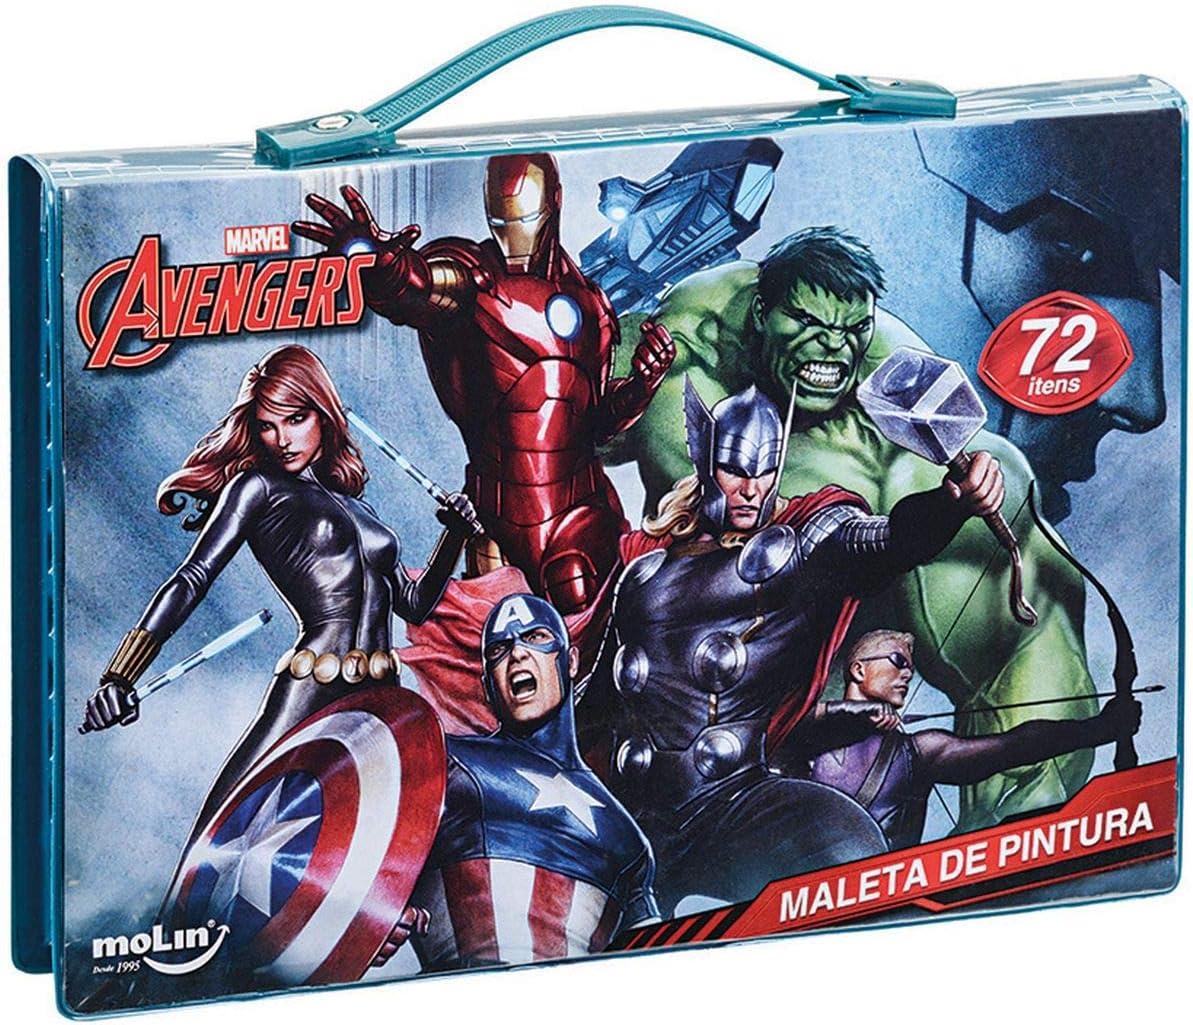 Maleta Para Pintura Licenciada The Avengers Completa Plastic